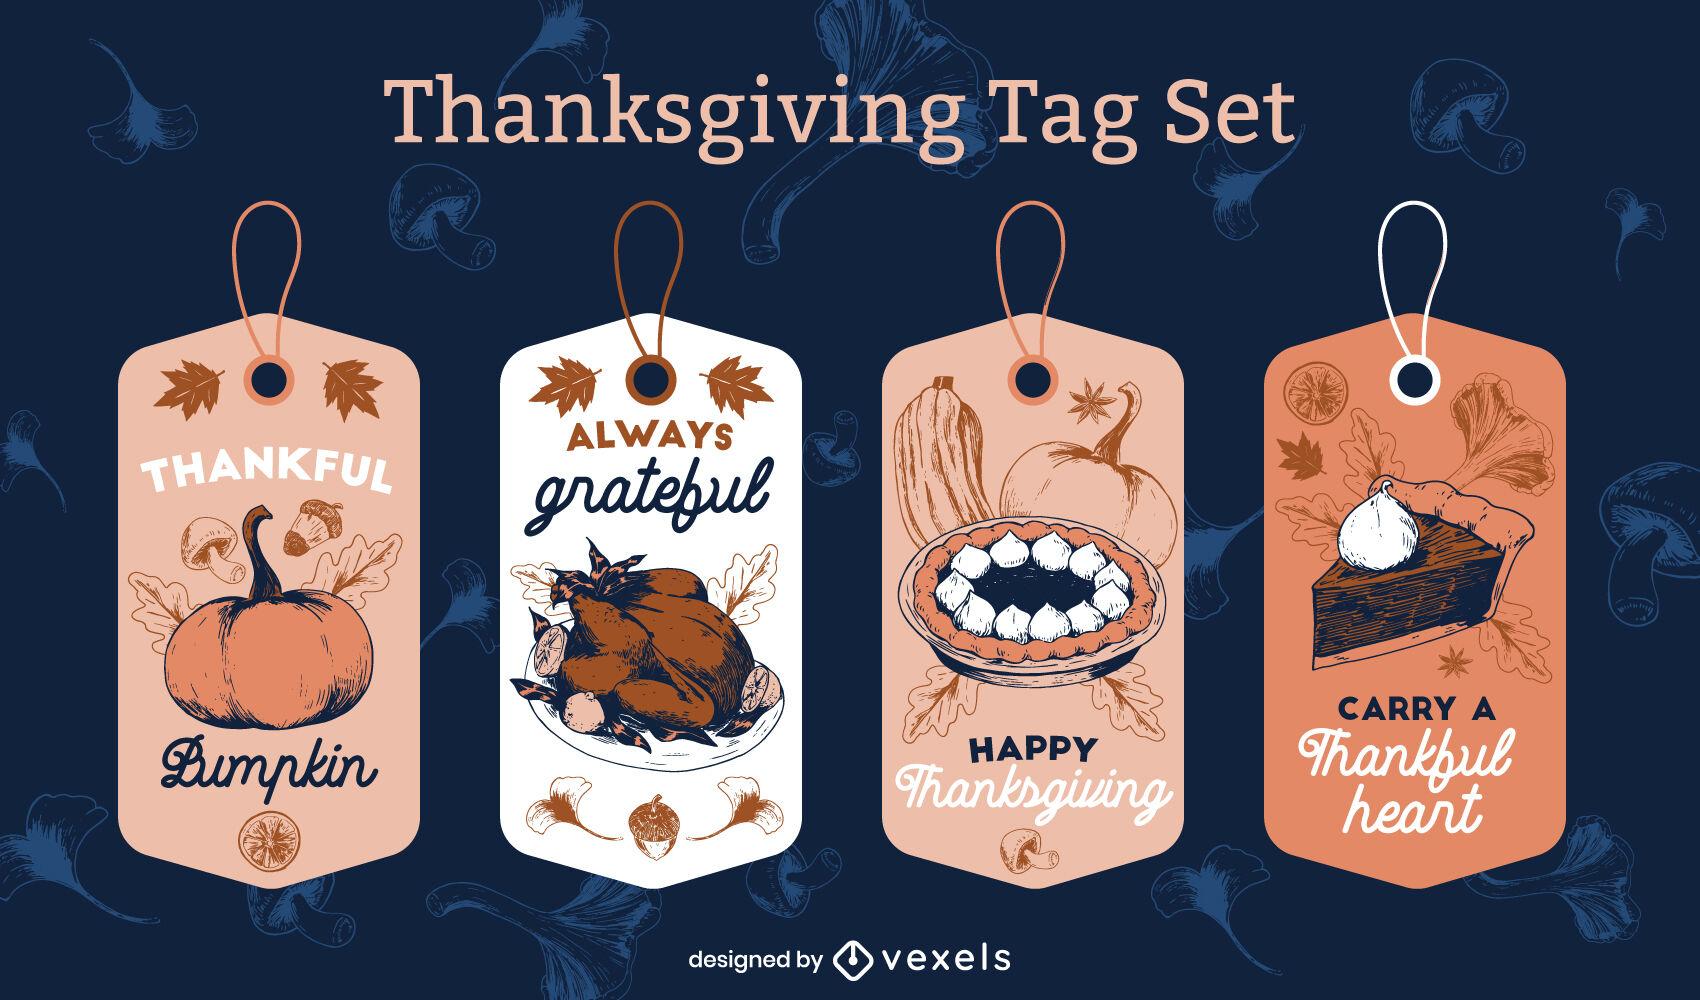 Thanksgiving traditional food tag set